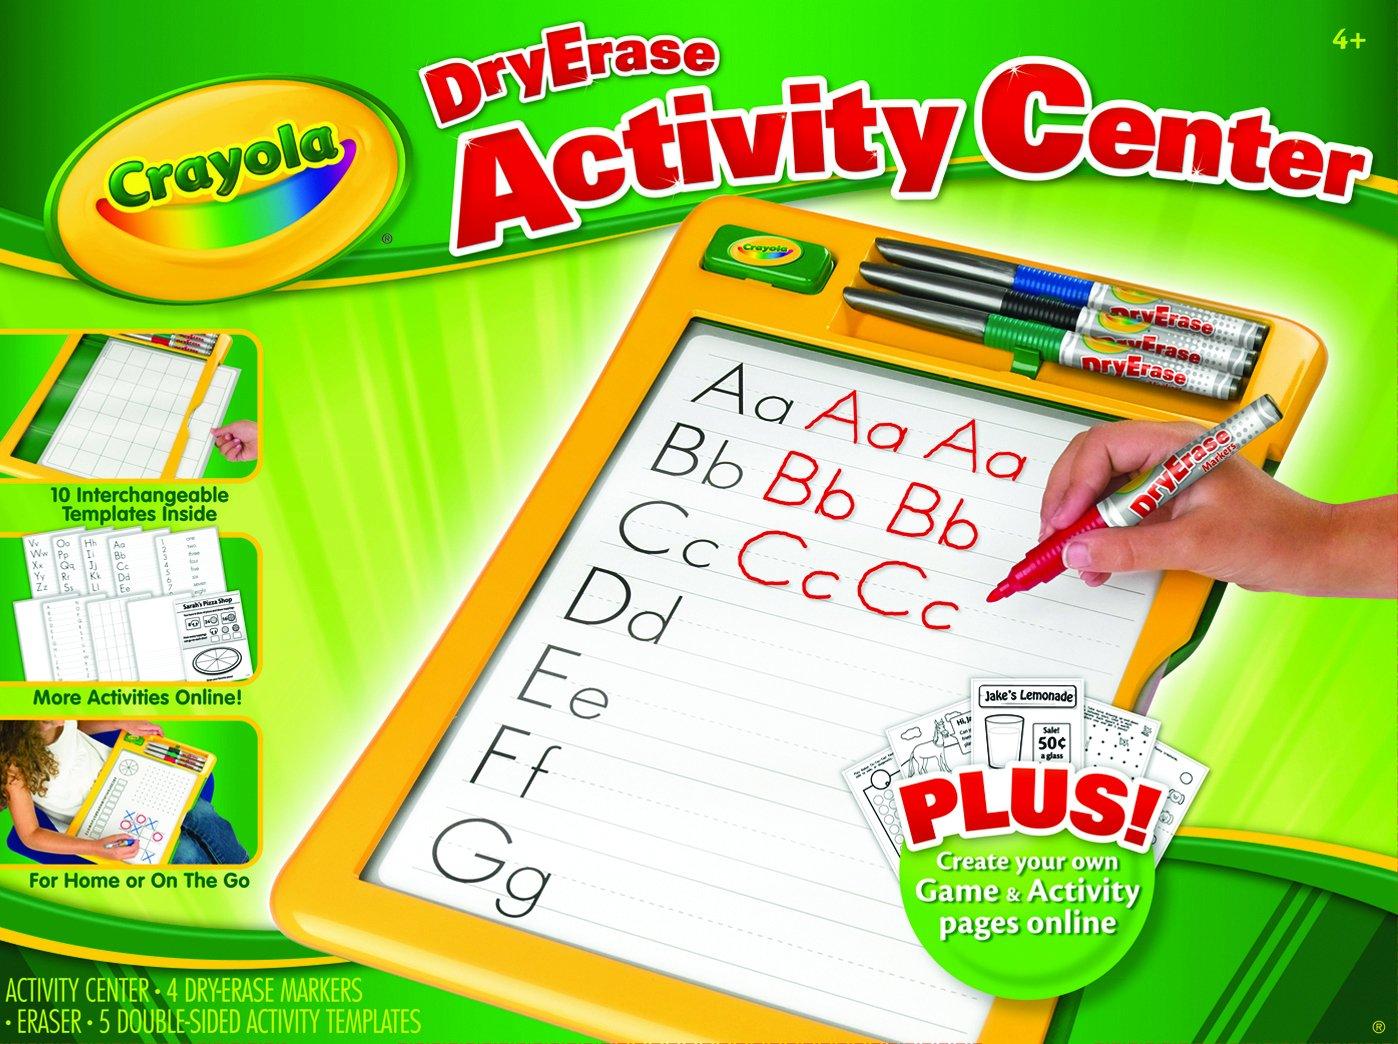 amazon com crayola dry erase activity center toys u0026 games